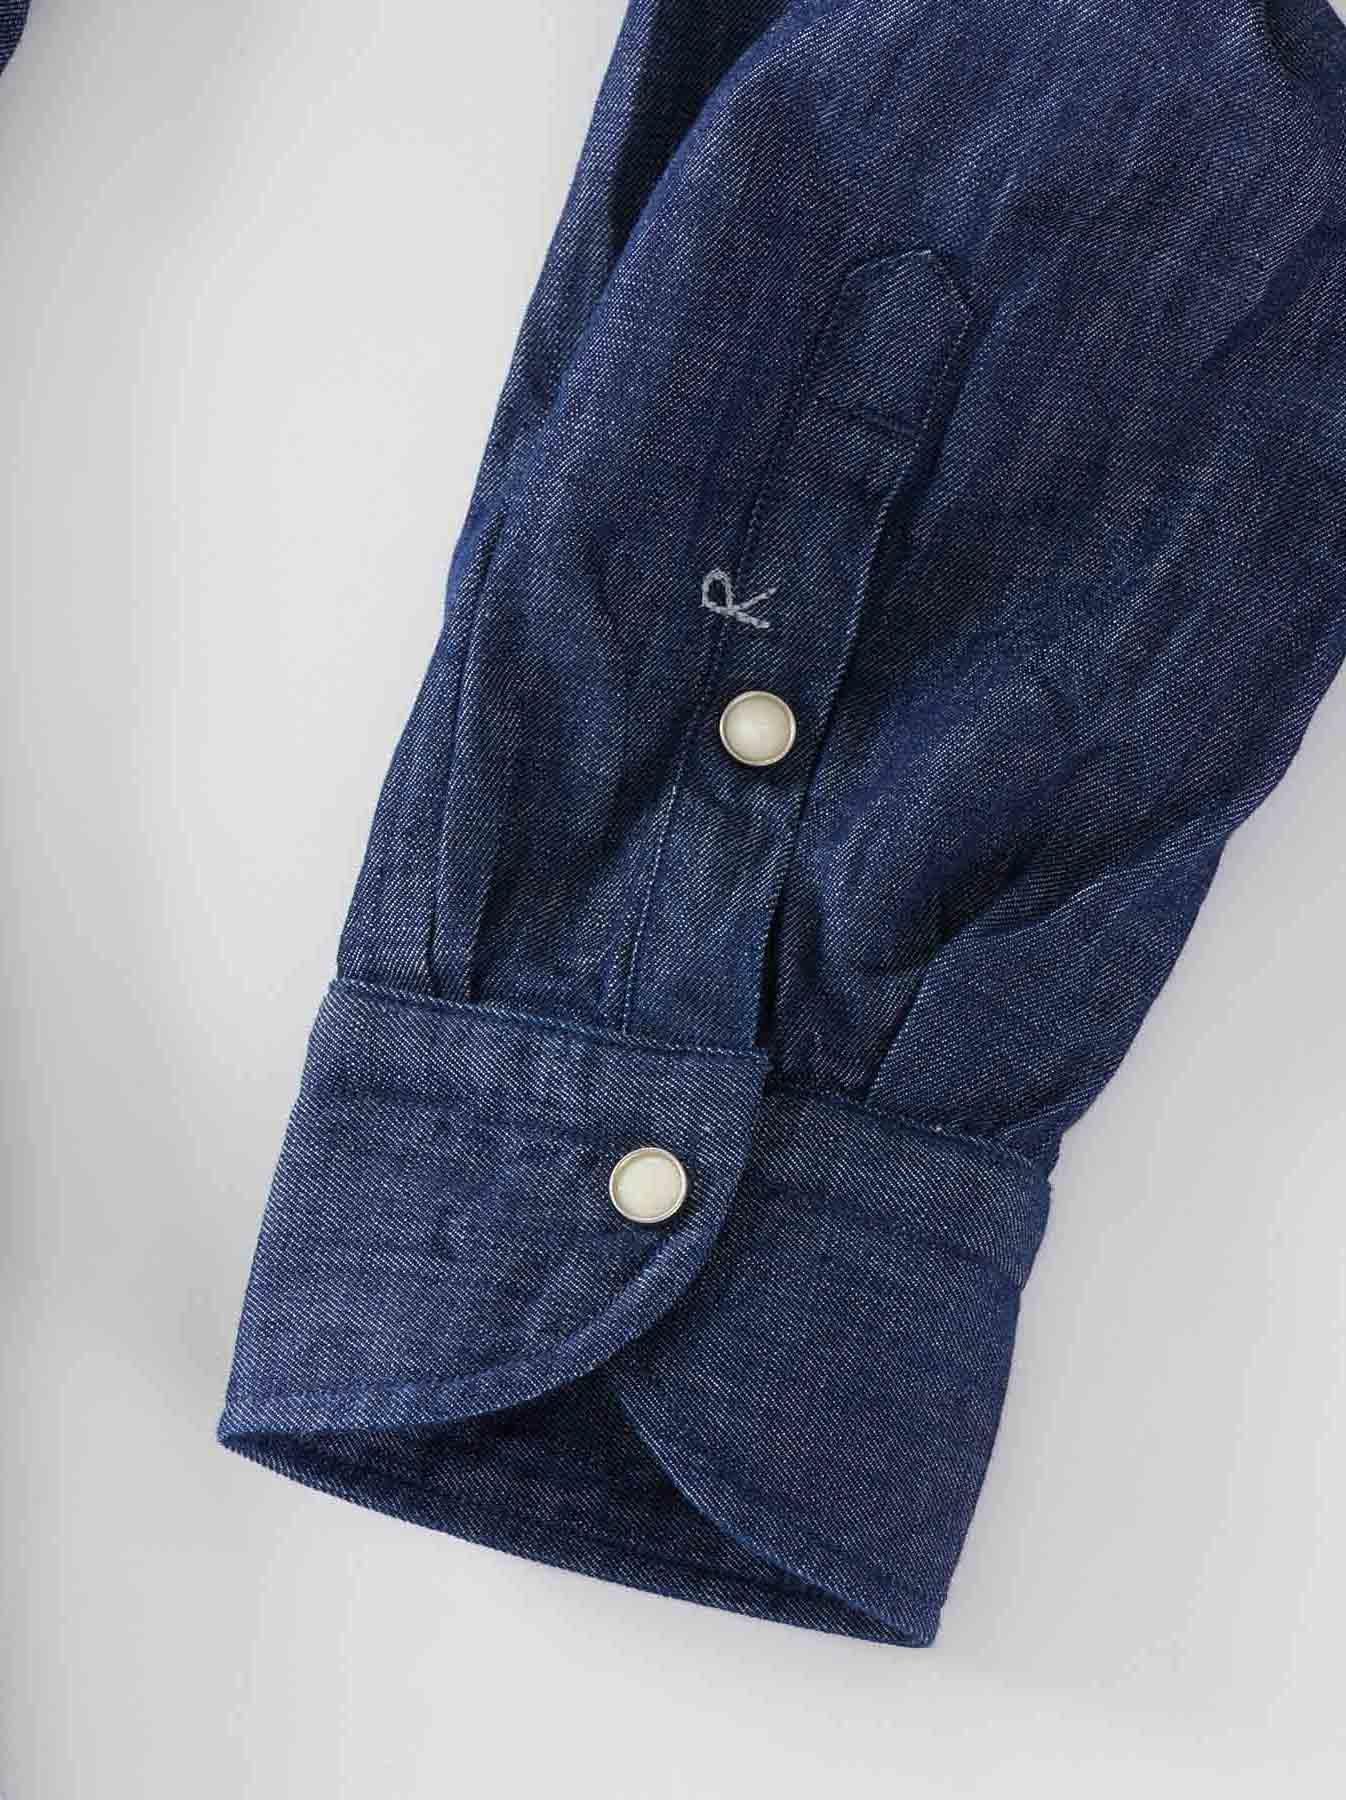 Goma Denim Stand Collar Eastern Shirt-11